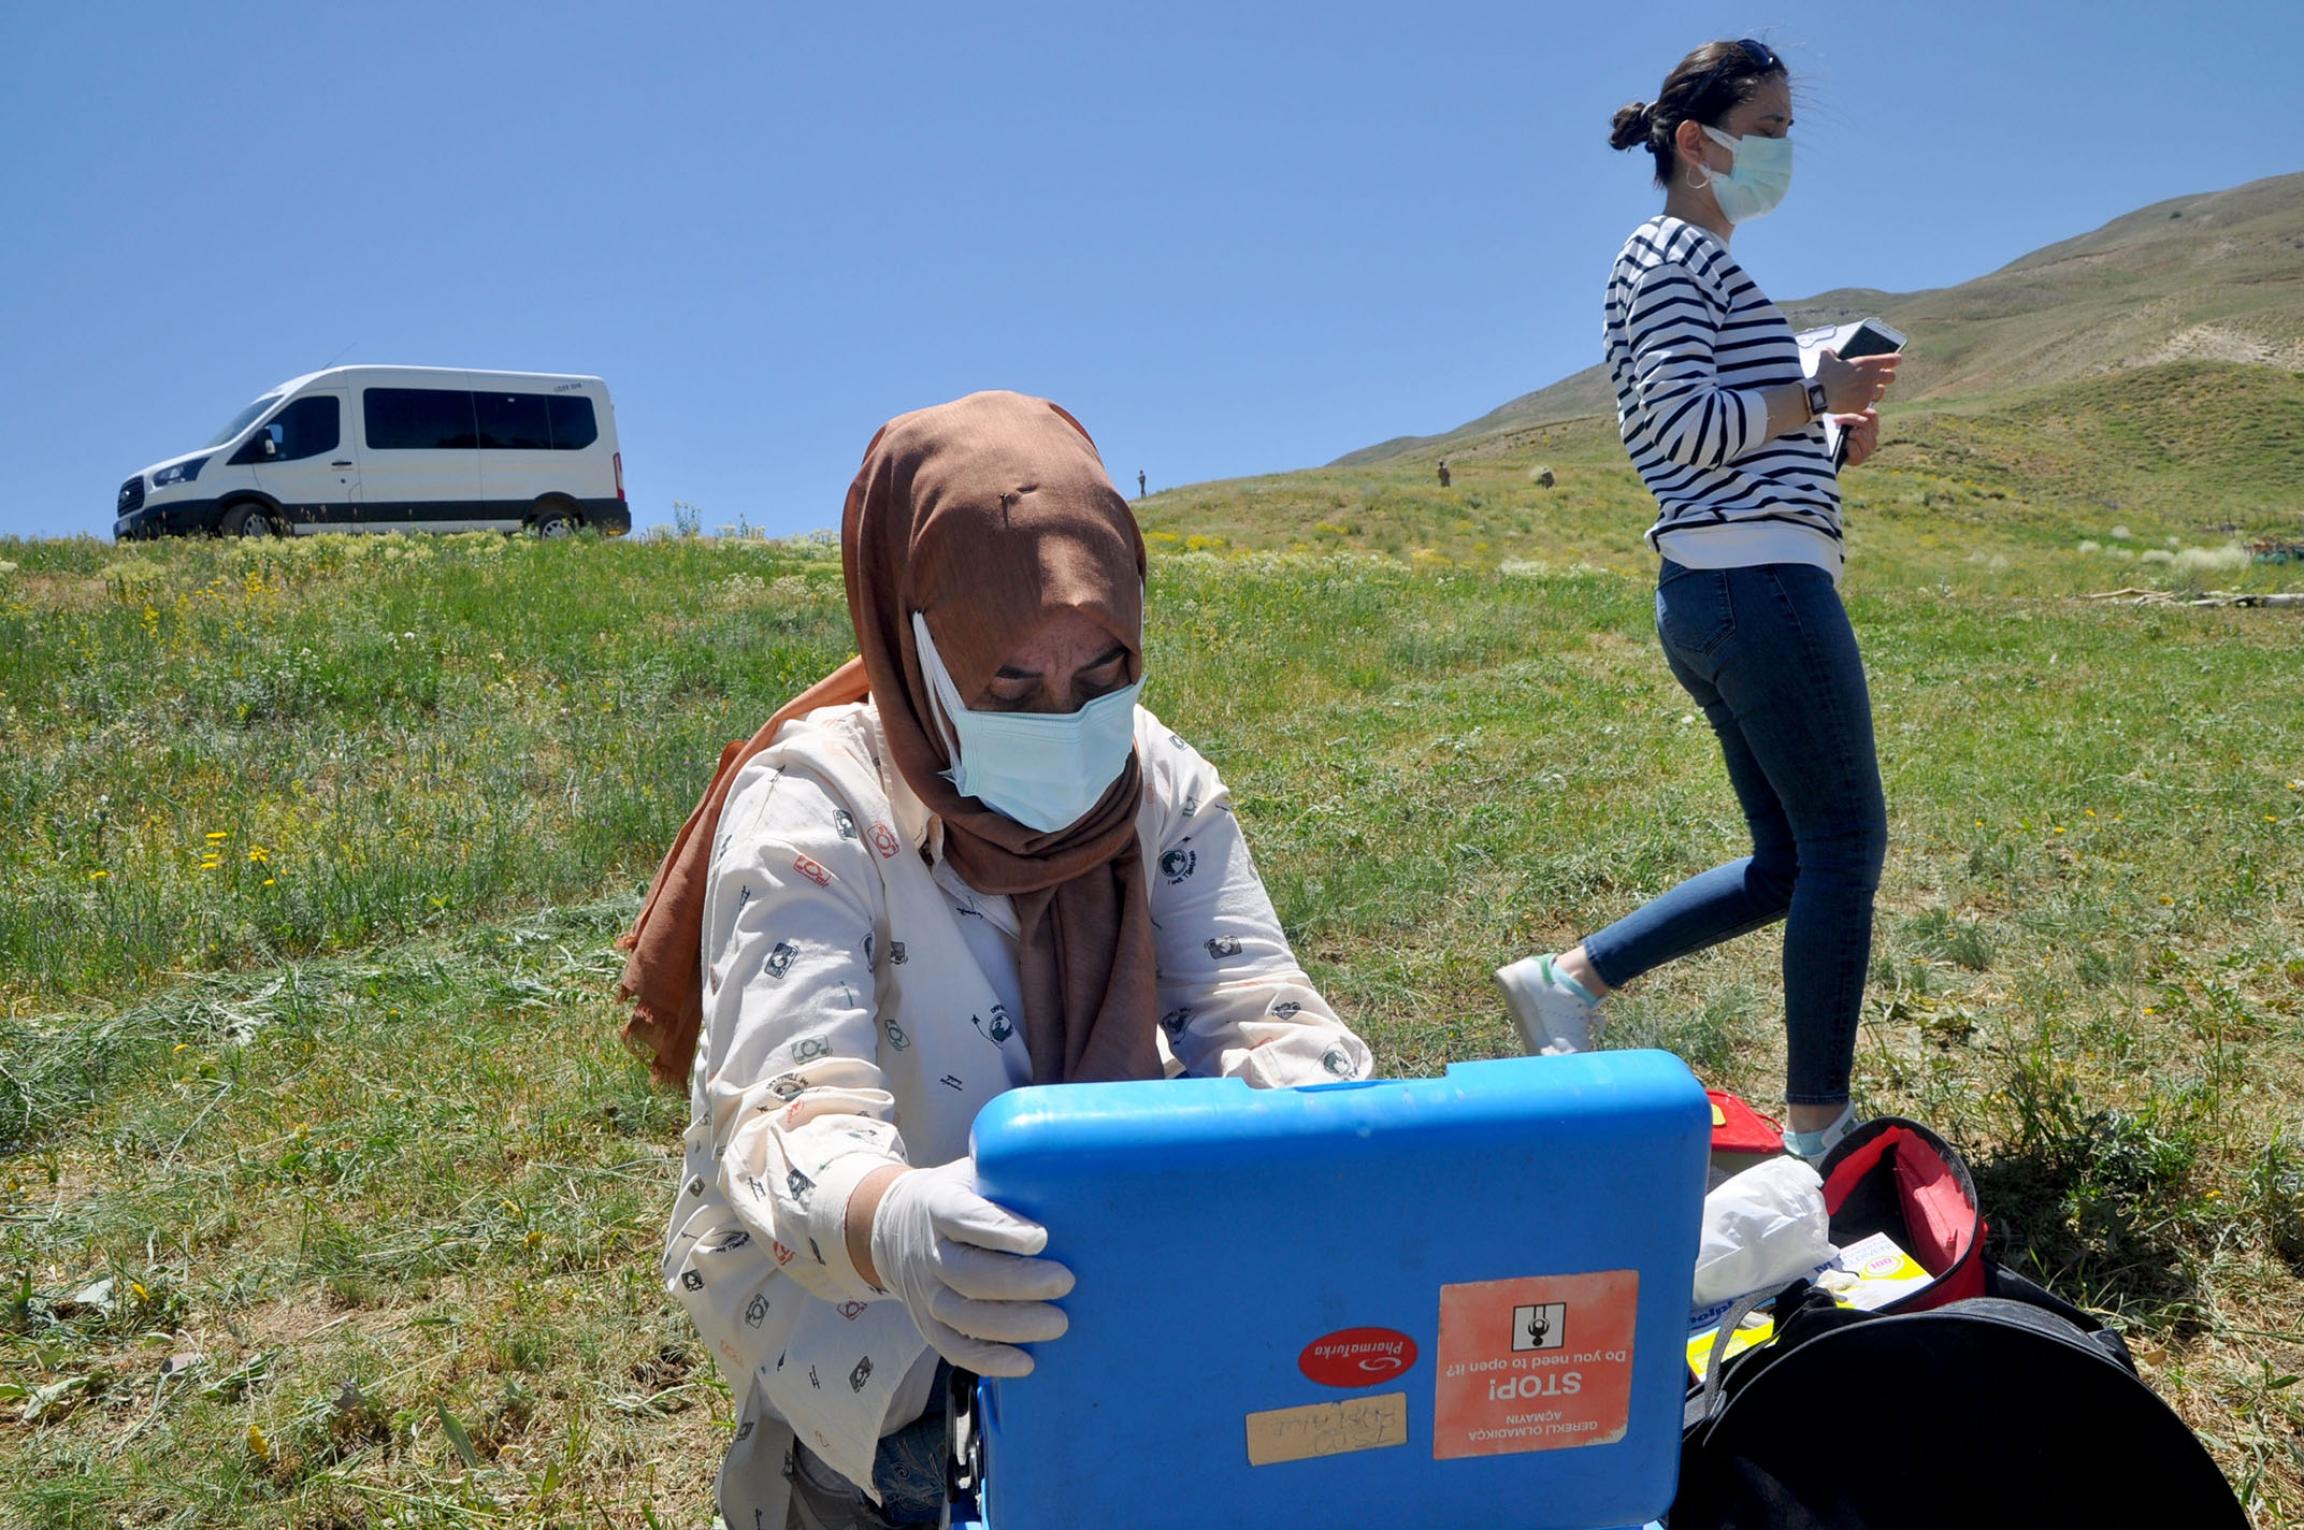 A health worker unloads equipment to vaccinate sheepherders in Ömerova, a village in Turkey's eastern Kurdish region.